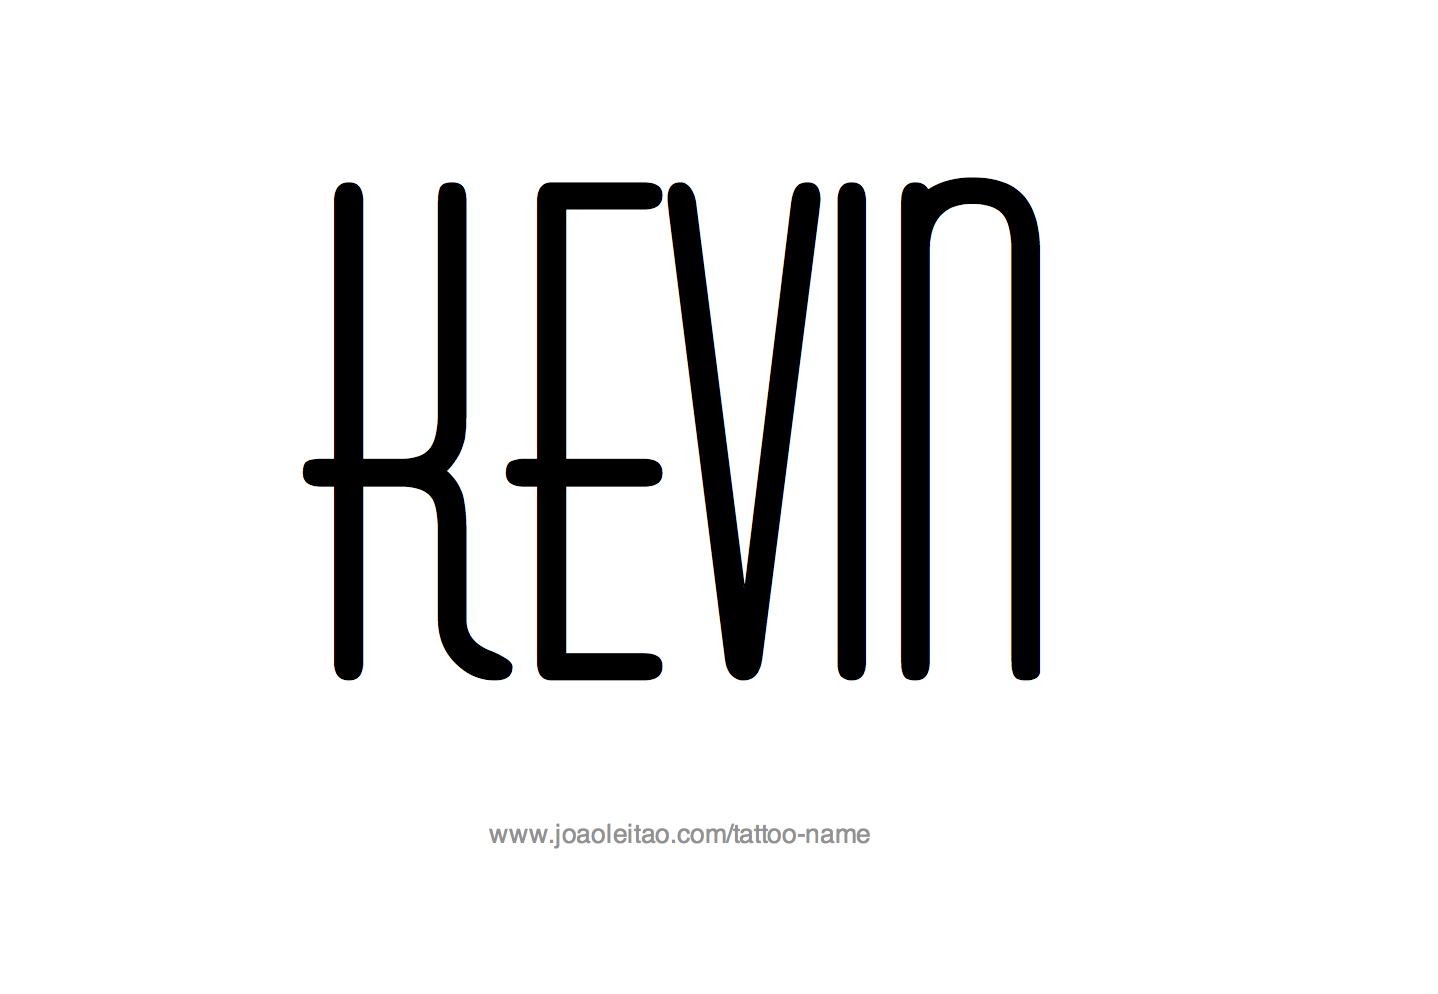 Tattoo Design Name Kevin